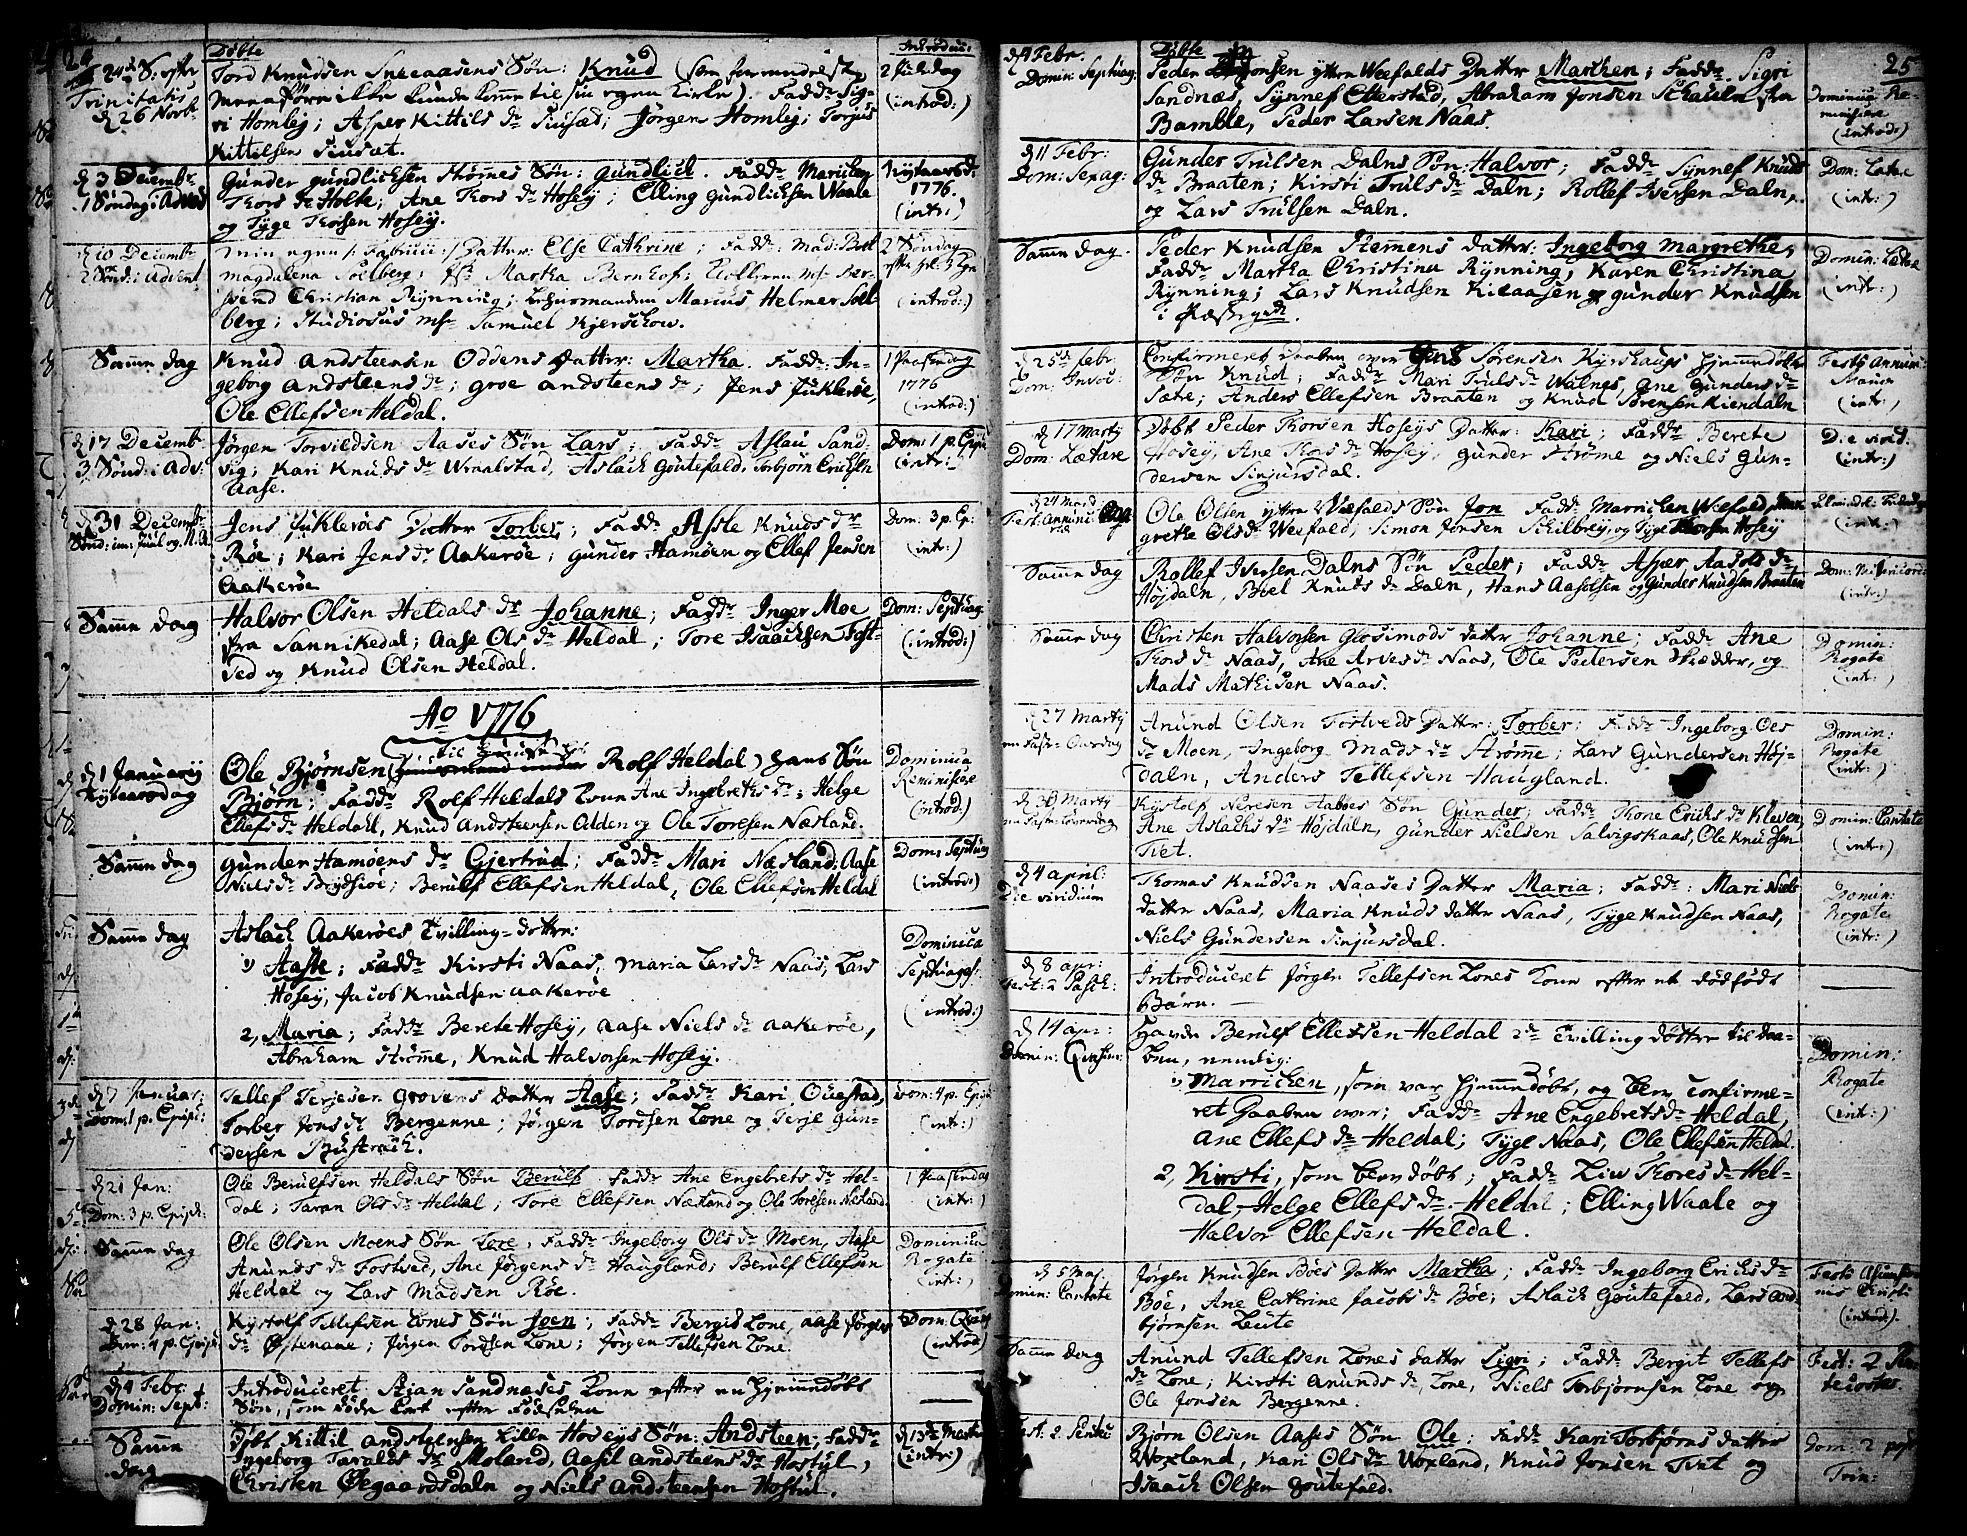 SAKO, Drangedal kirkebøker, F/Fa/L0003: Ministerialbok nr. 3, 1768-1814, s. 24-25